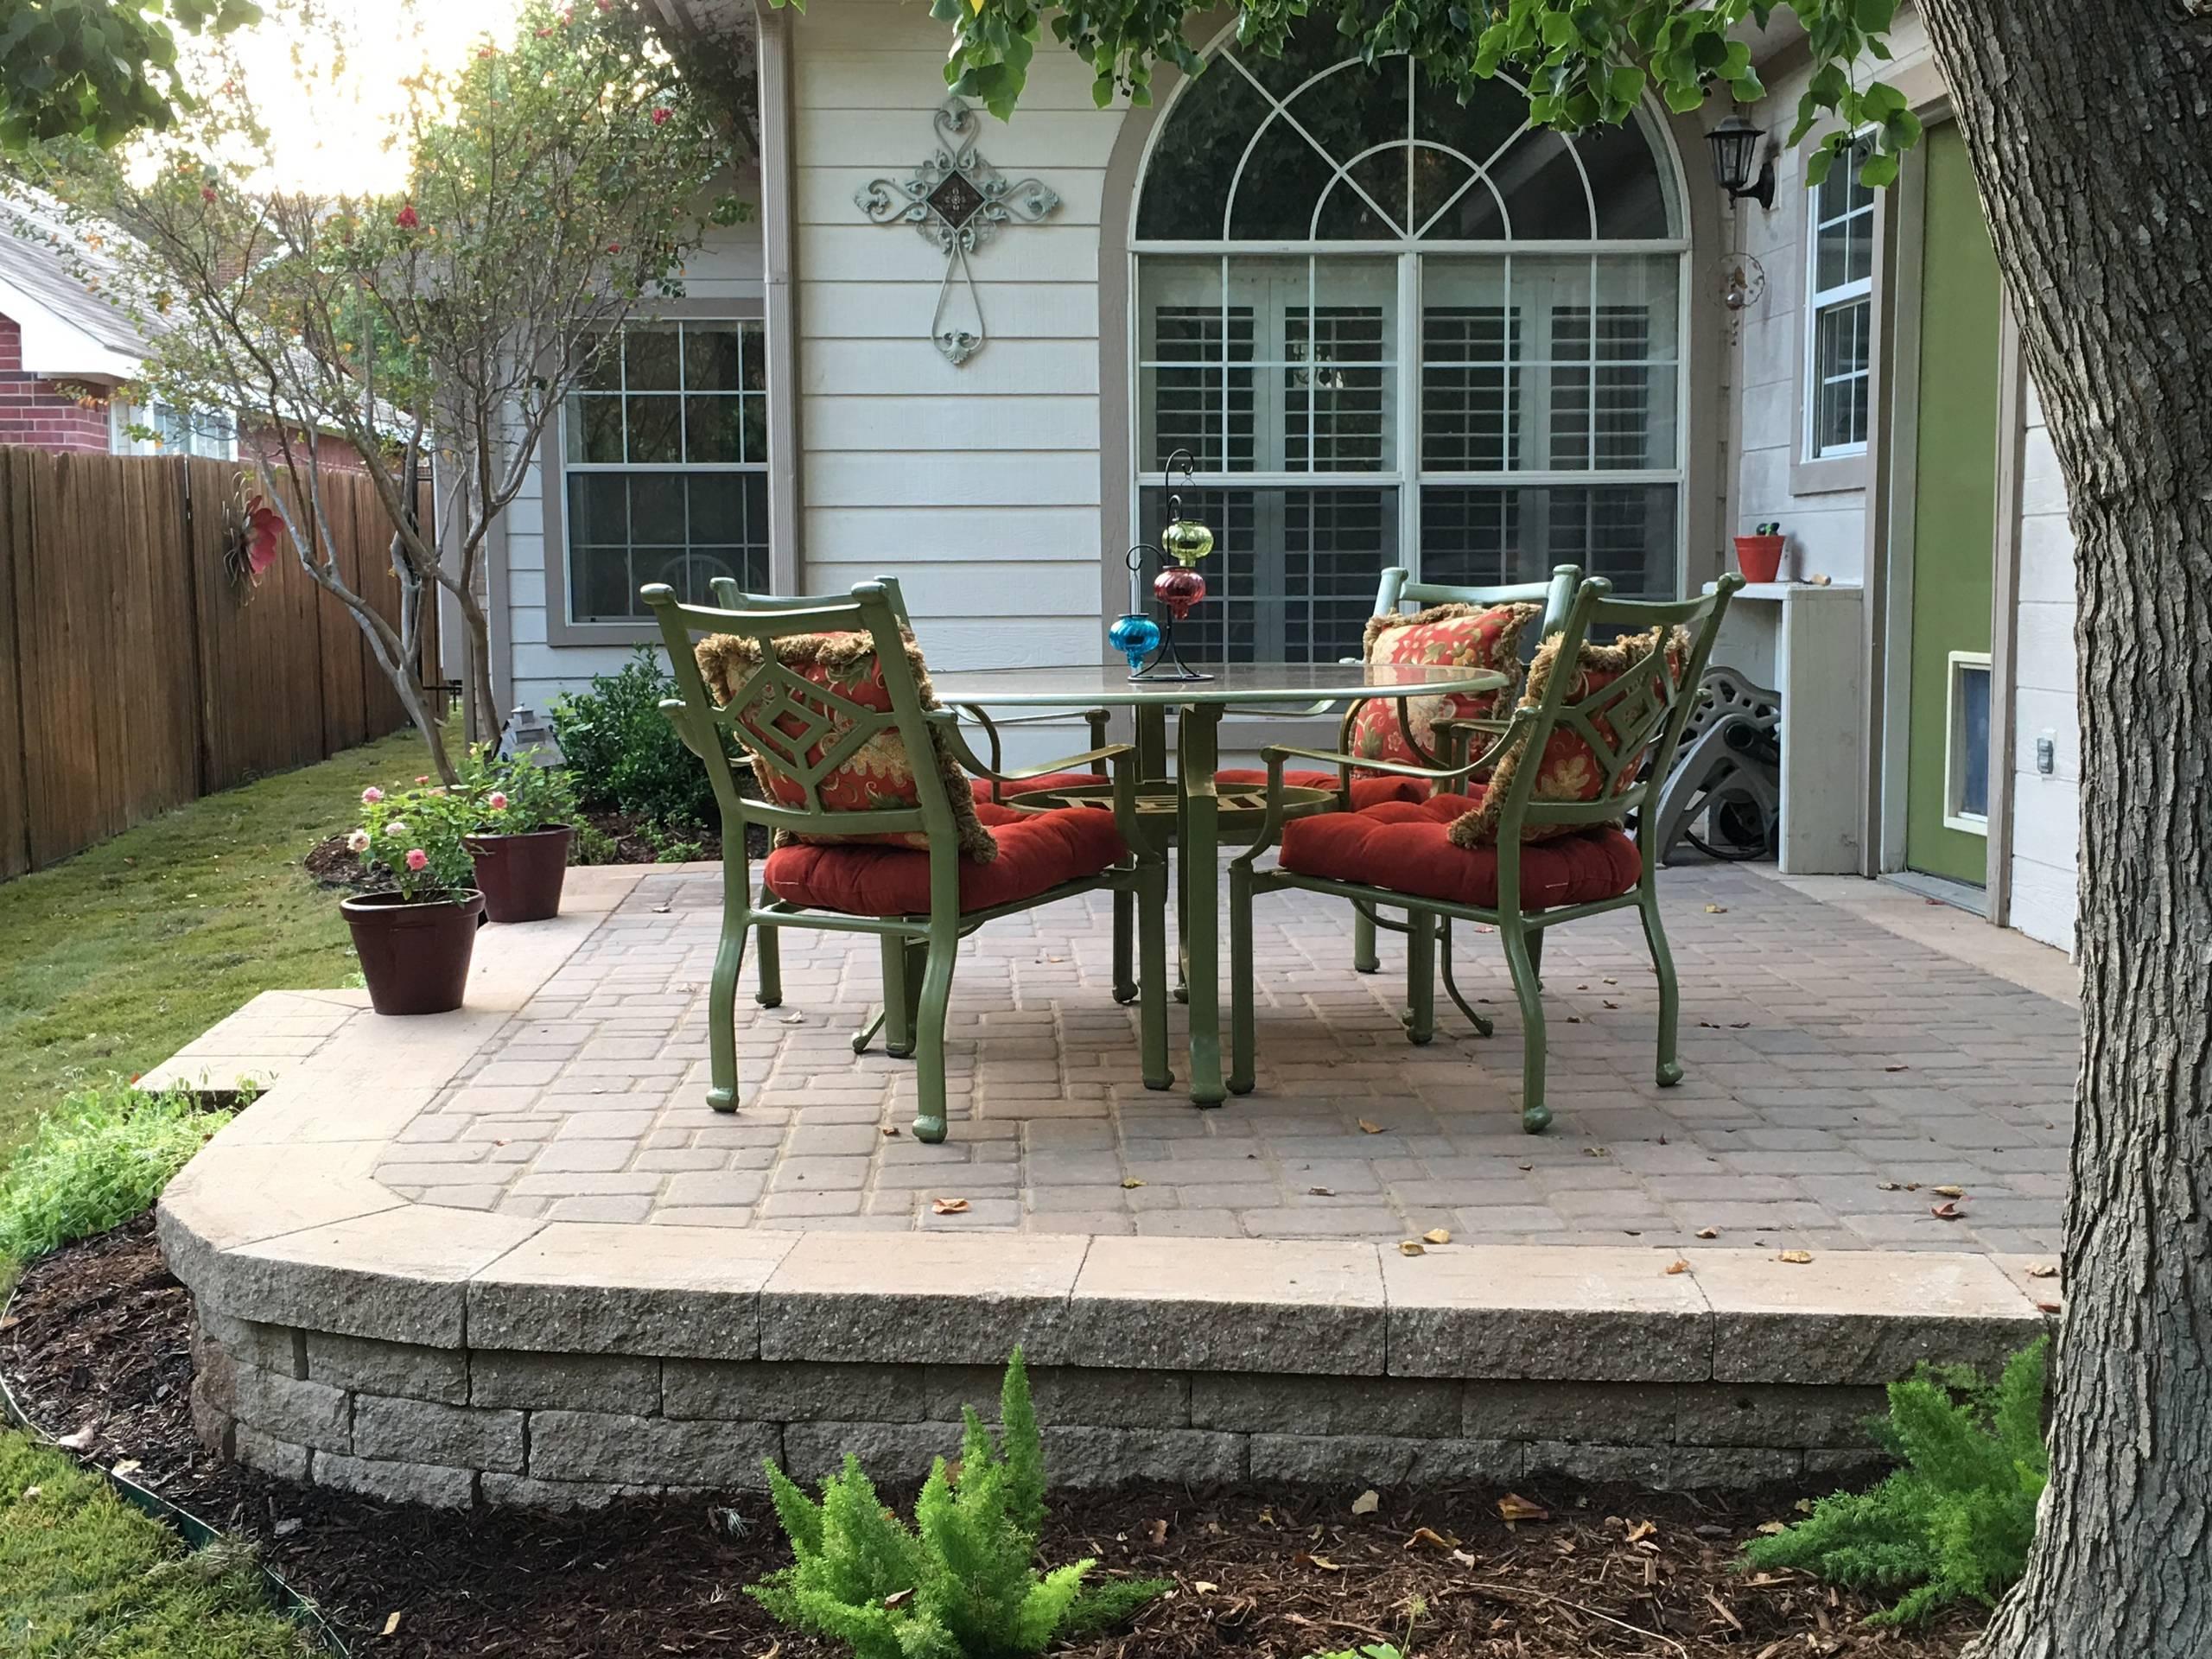 Belgard patio